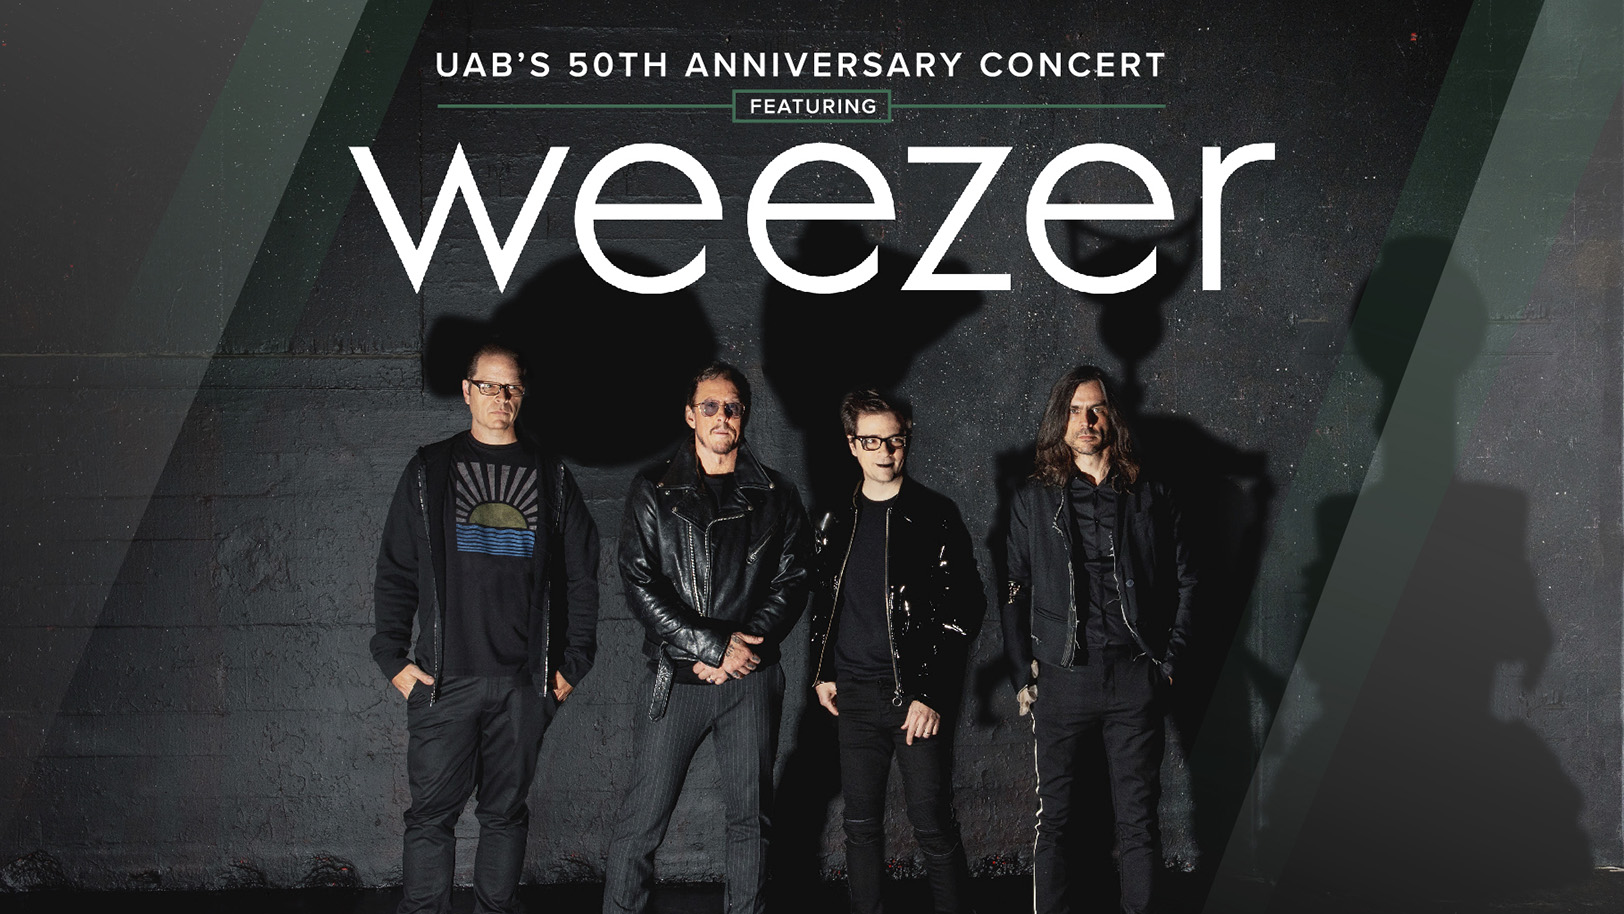 Weezer: UAB's 50th Anniversary Concert